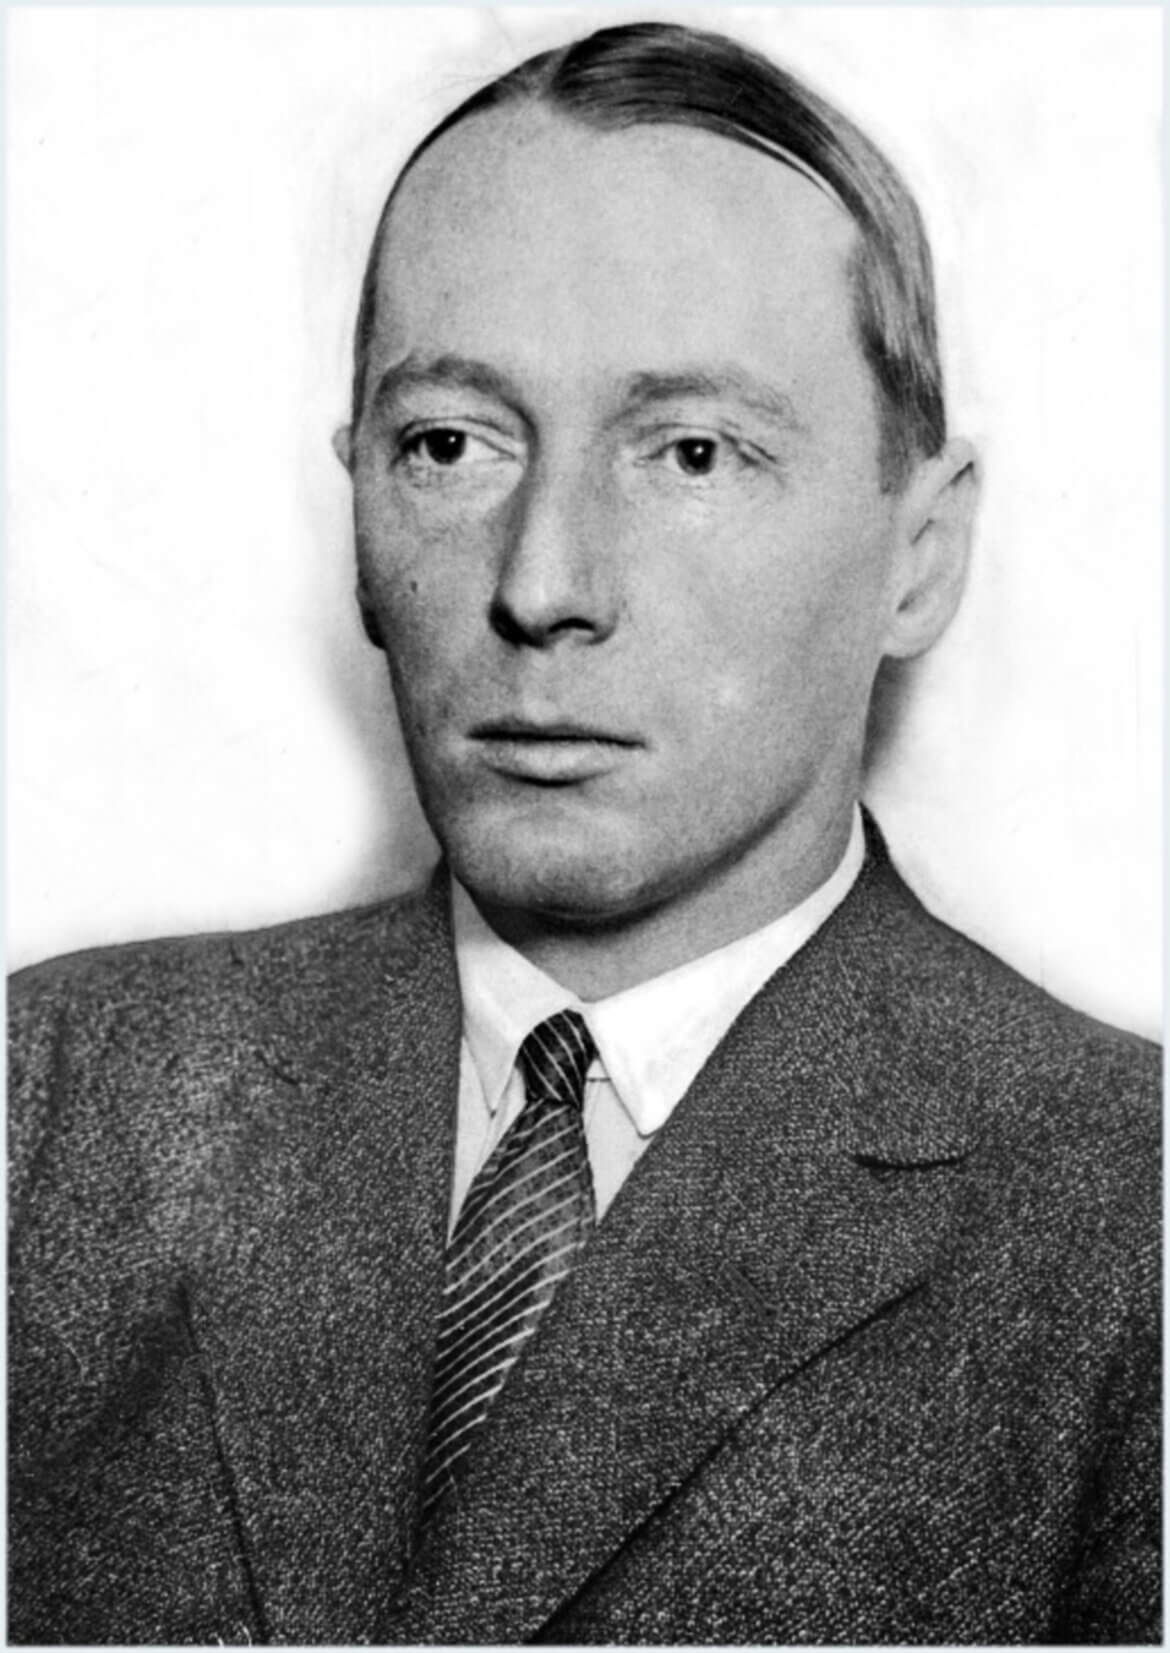 Lernet-Holenia, Alexander